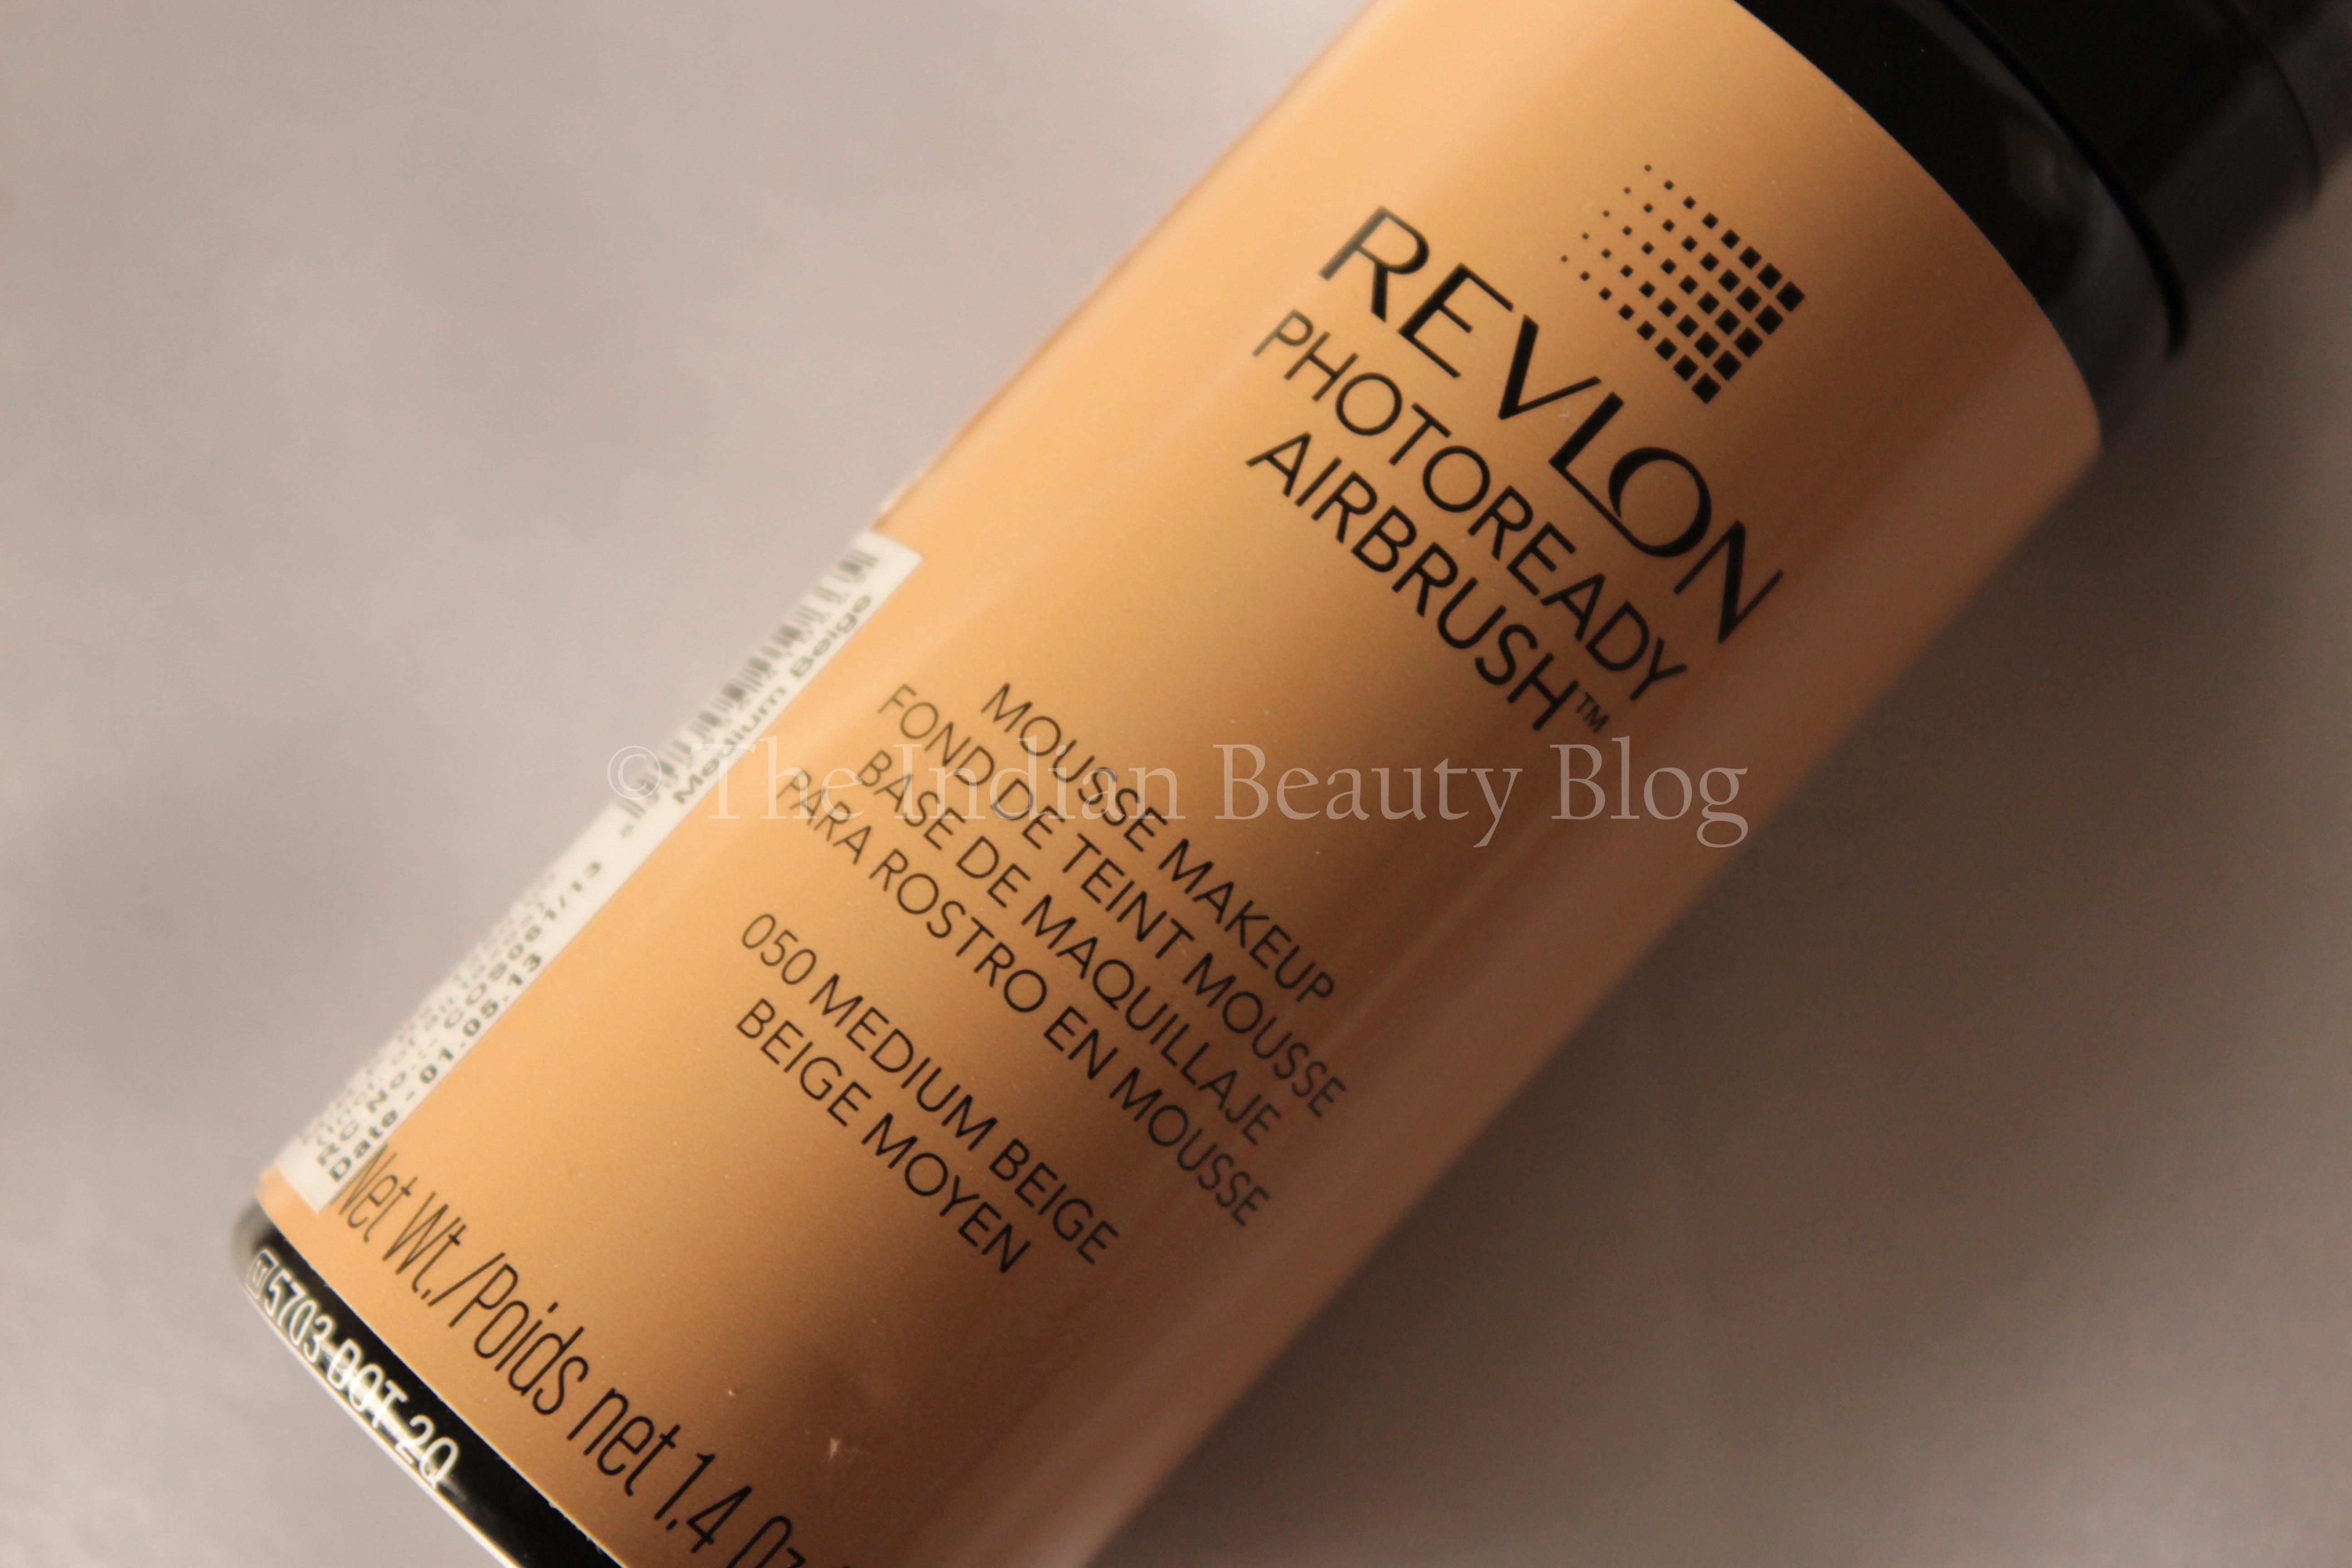 Revlon Phtoready Airbrush Foundation